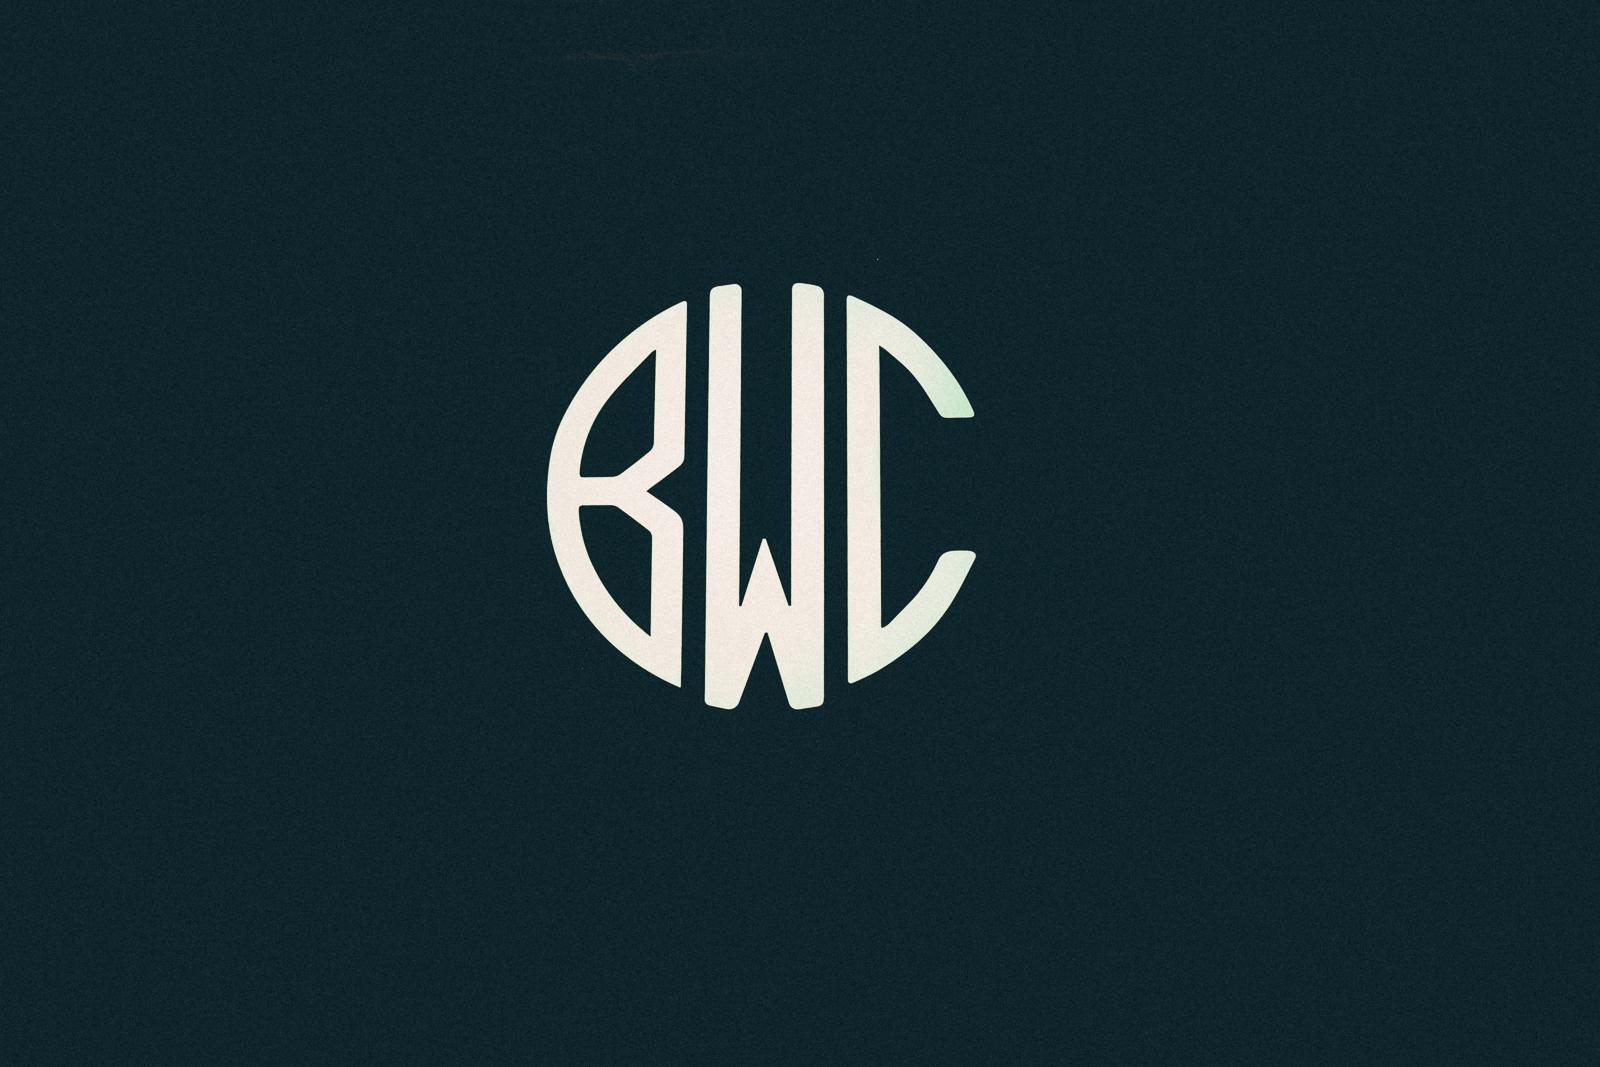 bwc-sounds-lakim-whooligan-14.jpg